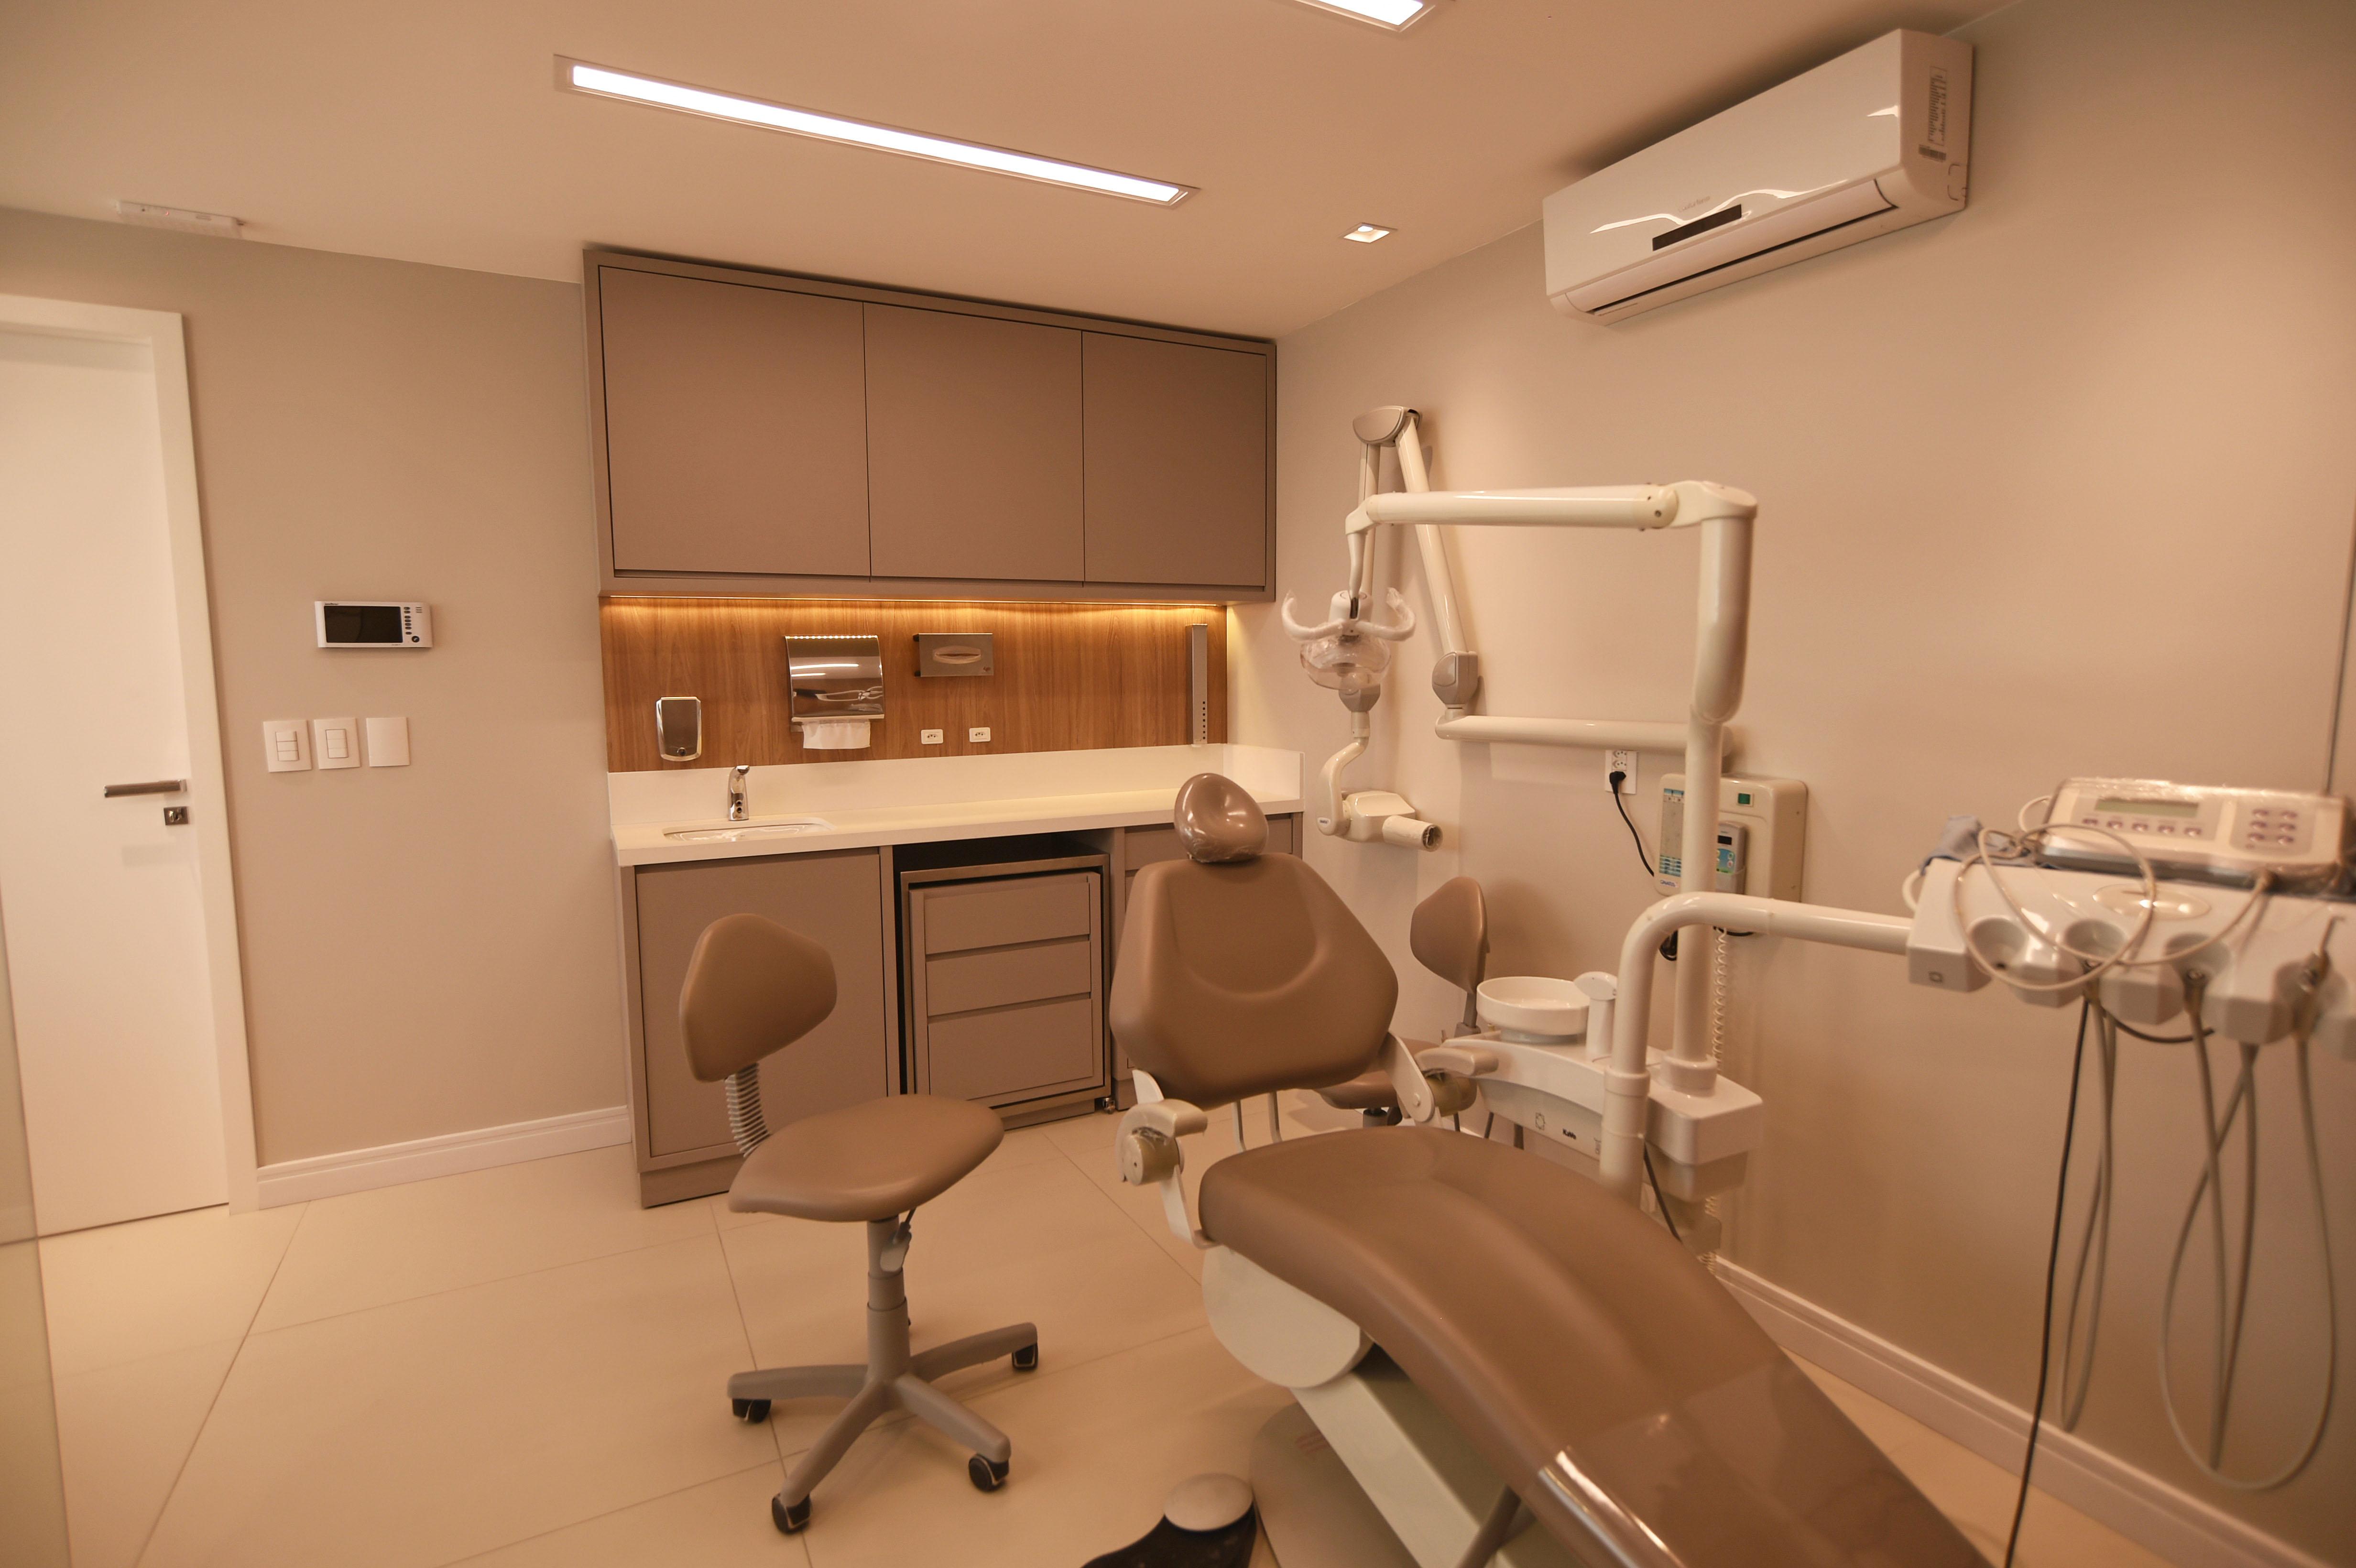 Clínica Odontológica Caldart